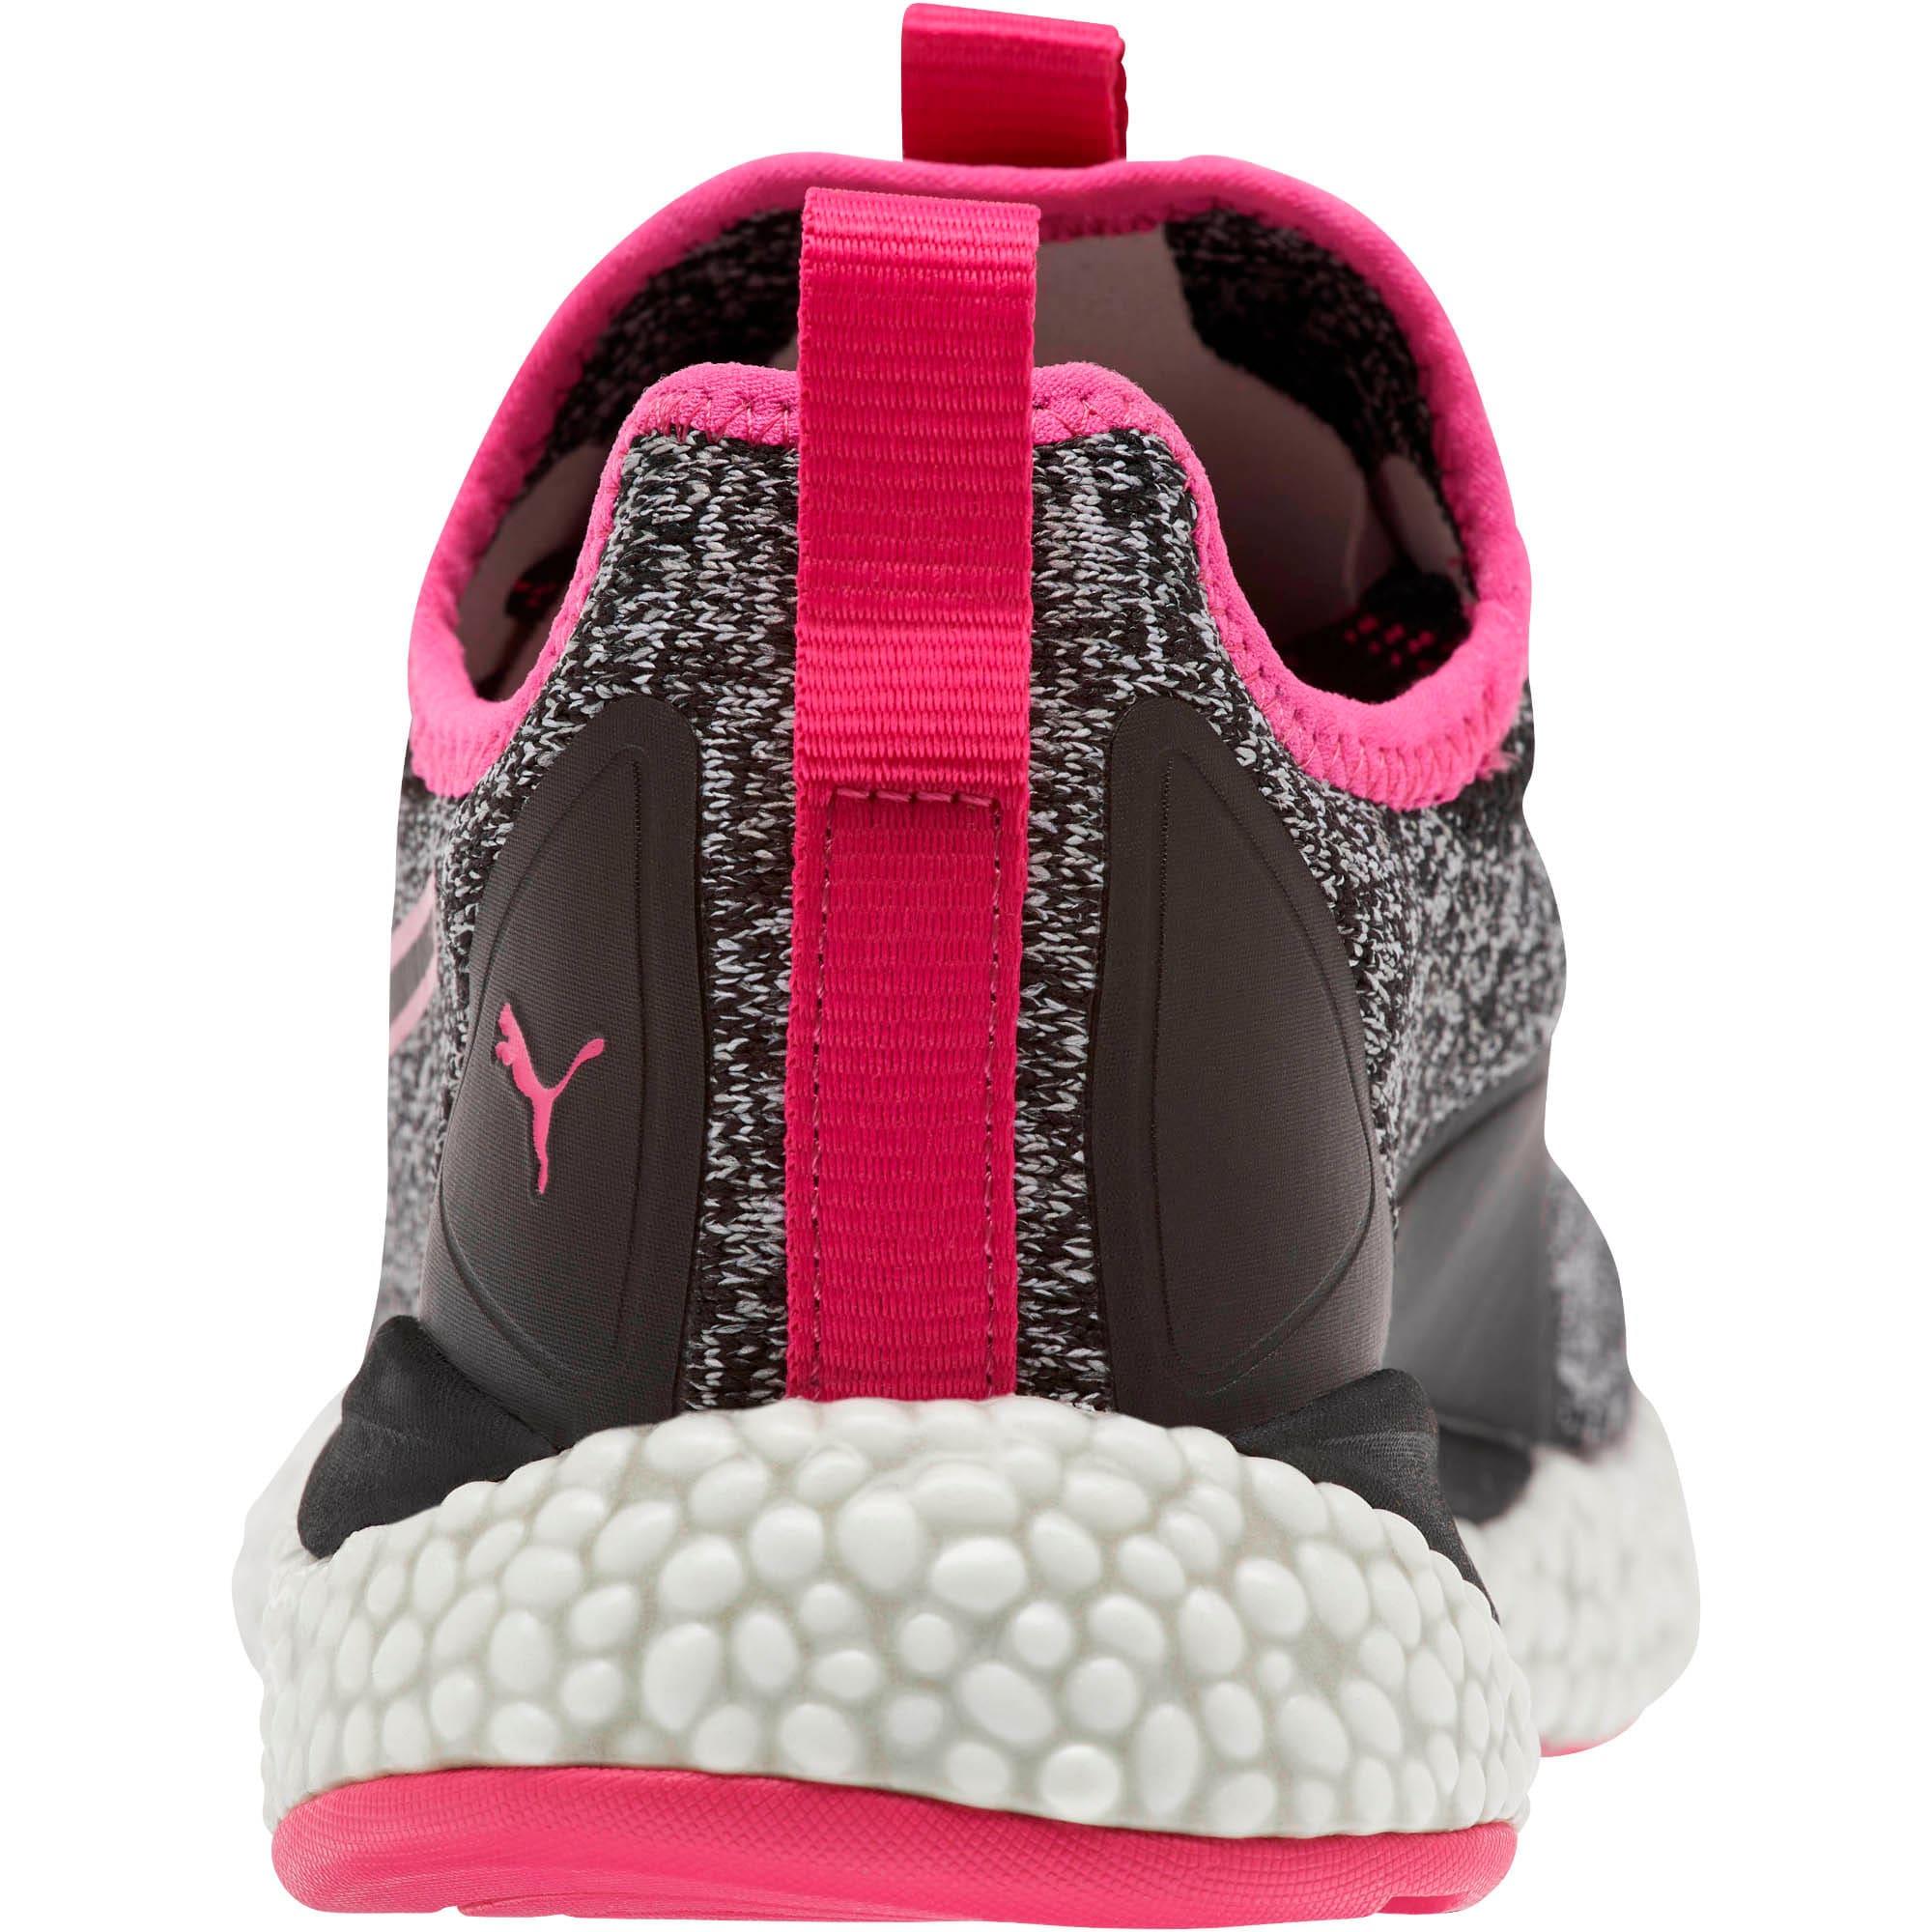 Thumbnail 3 of HYBRID Runner Women's Running Shoes, Puma Black-Fuchsia Purple, medium